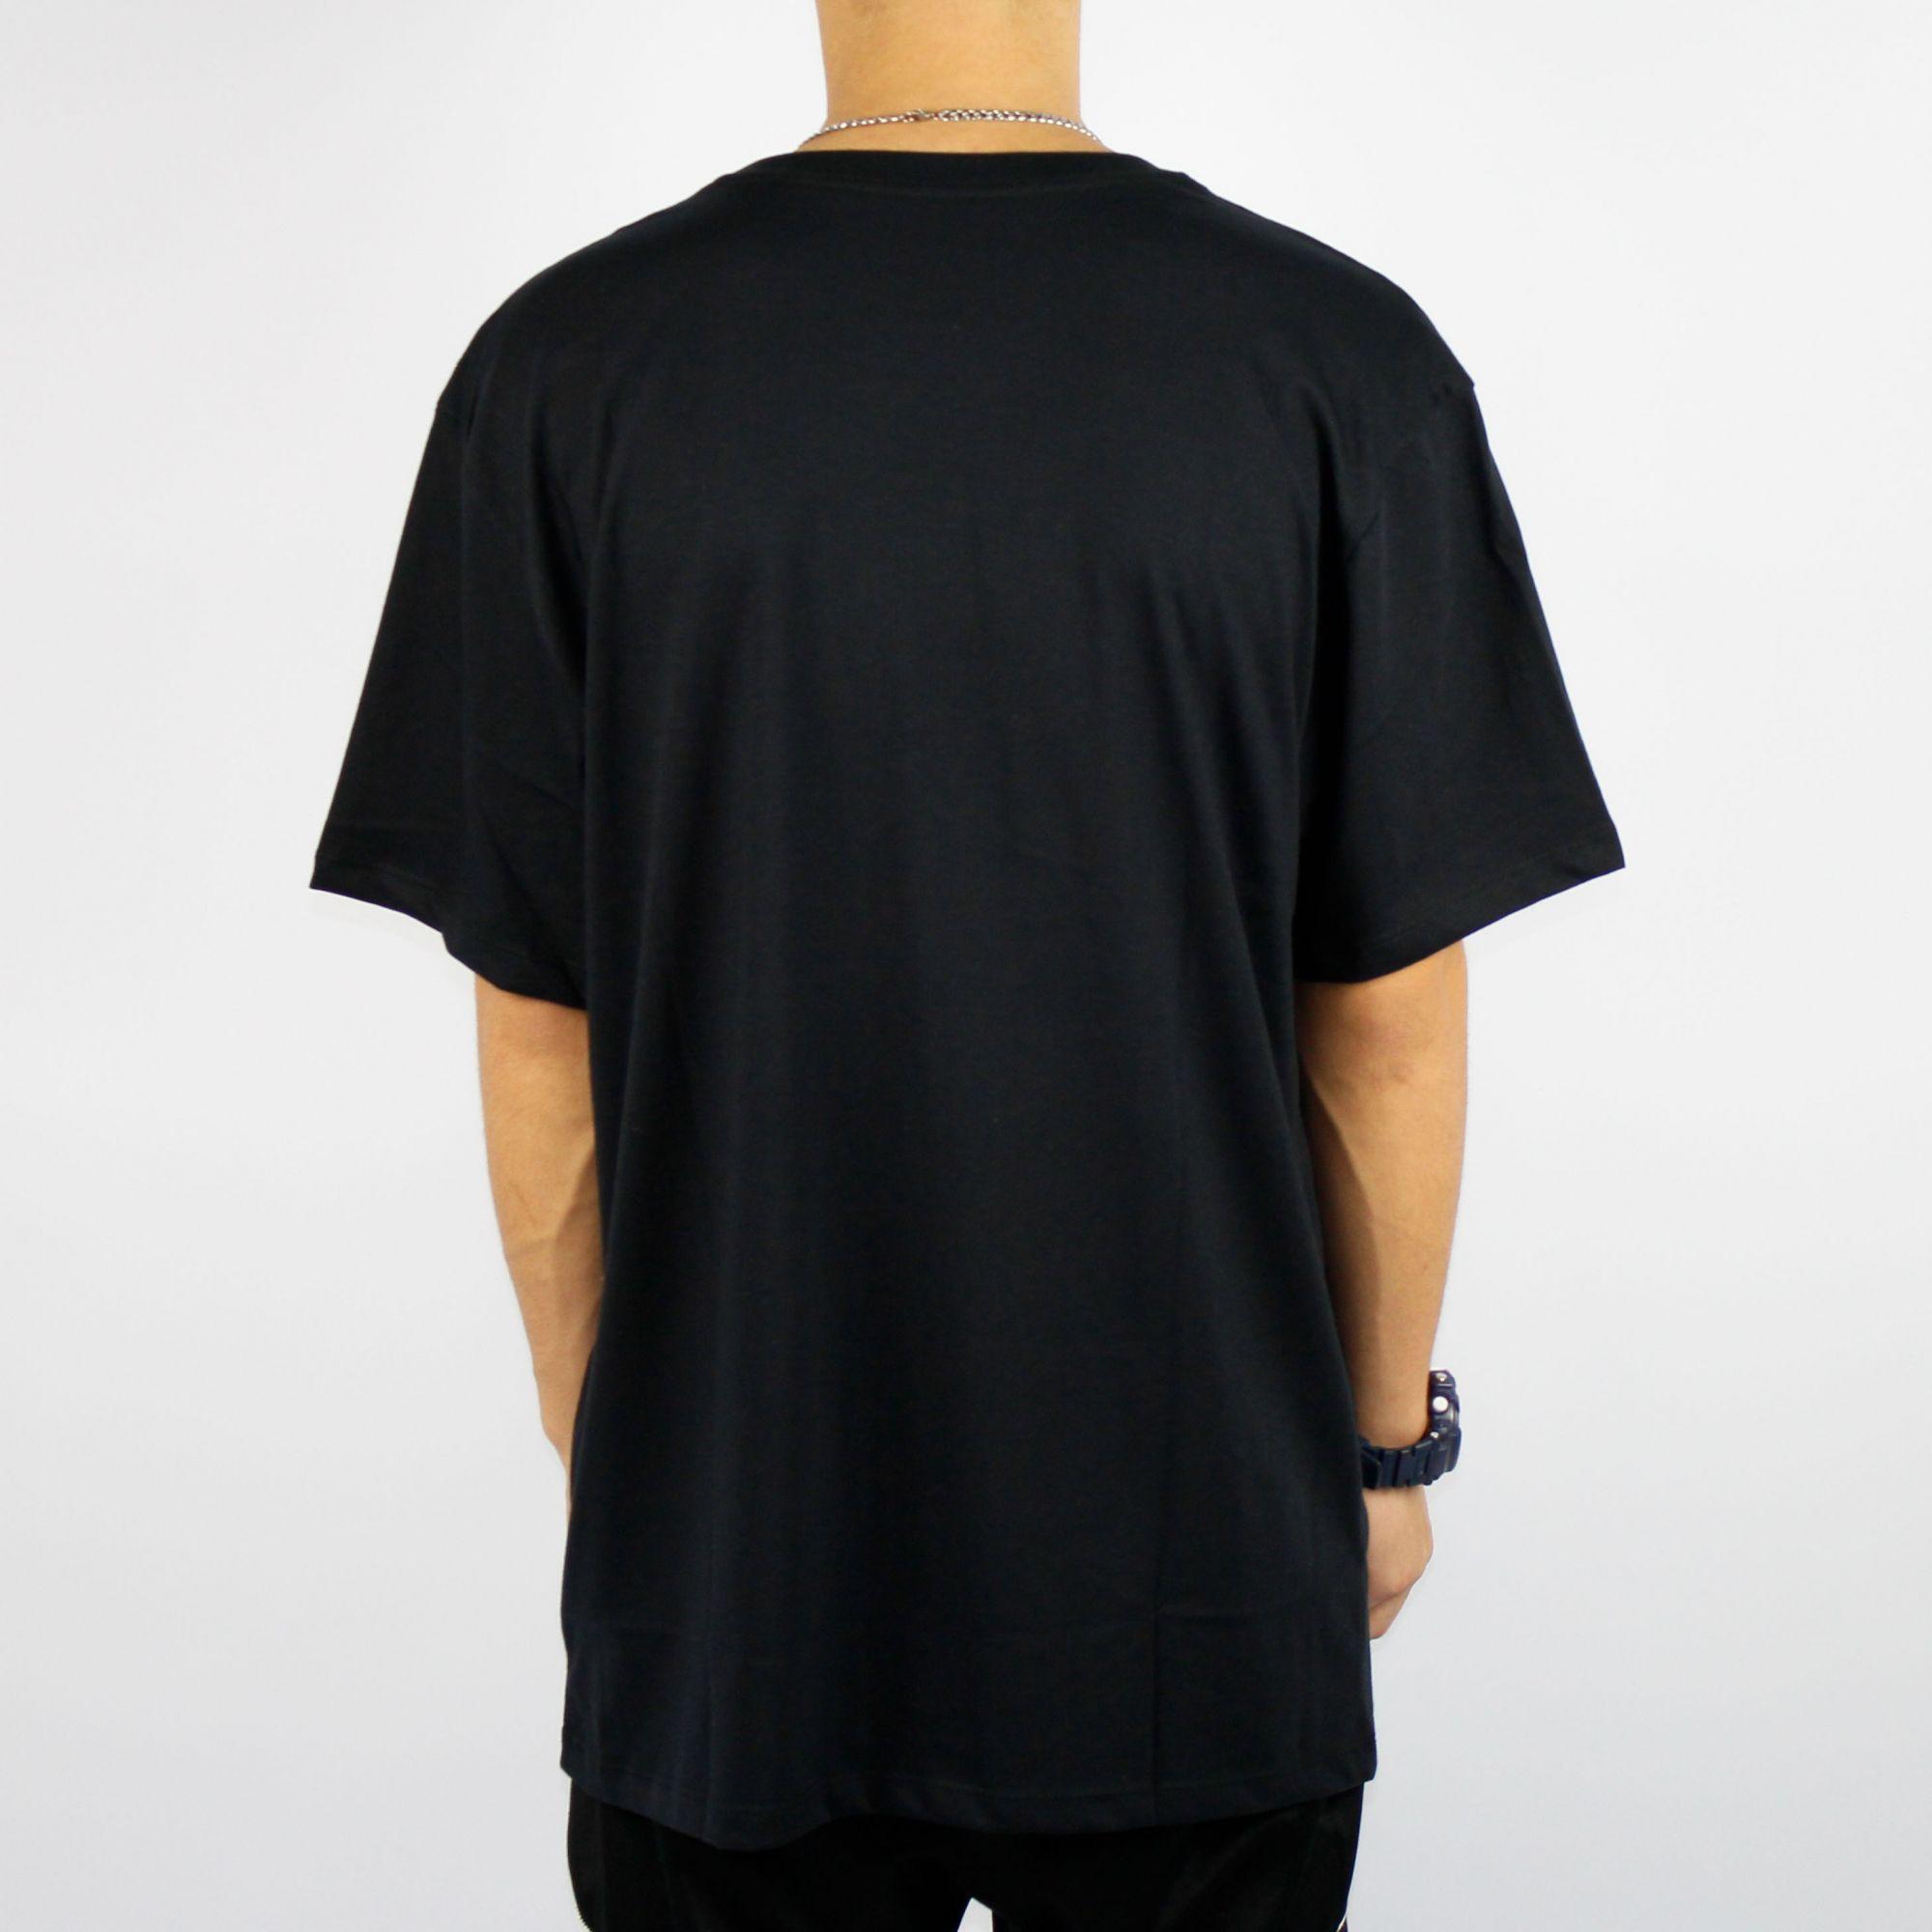 Camiseta Dc Shoes Pacting Basica Preta/Azul/Roxa